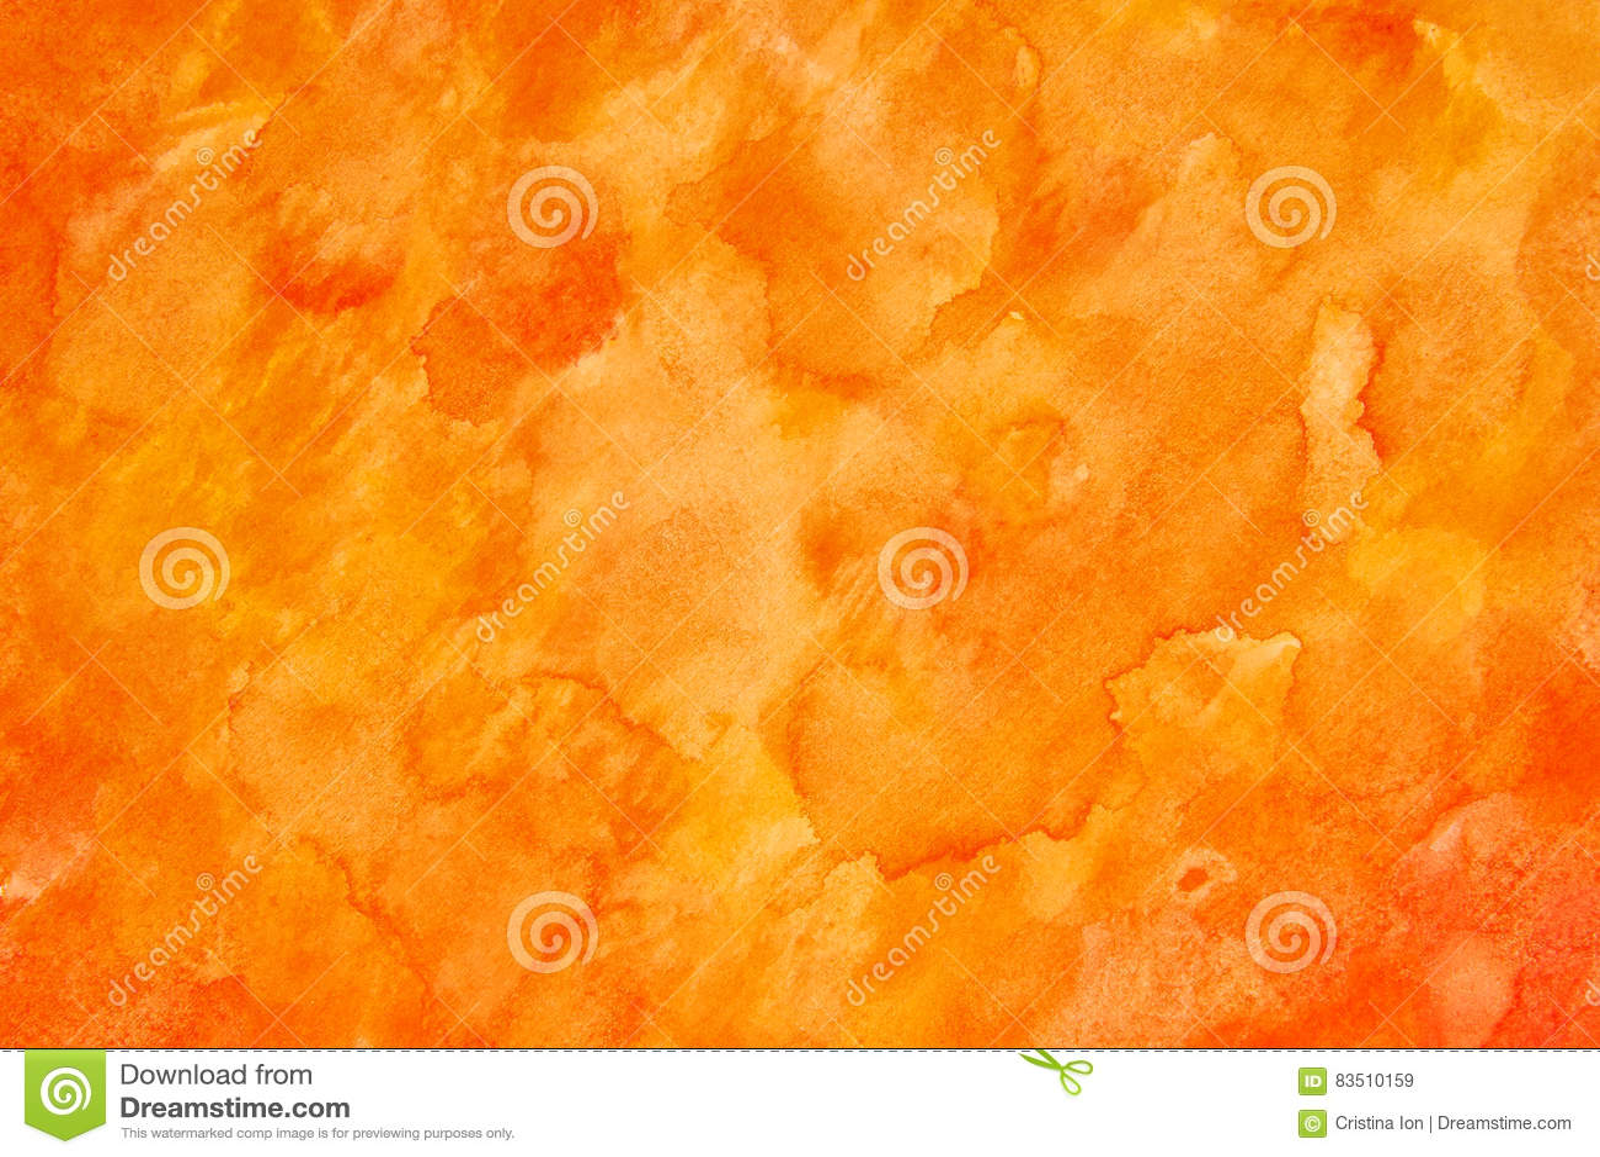 Orange watercolour abstract